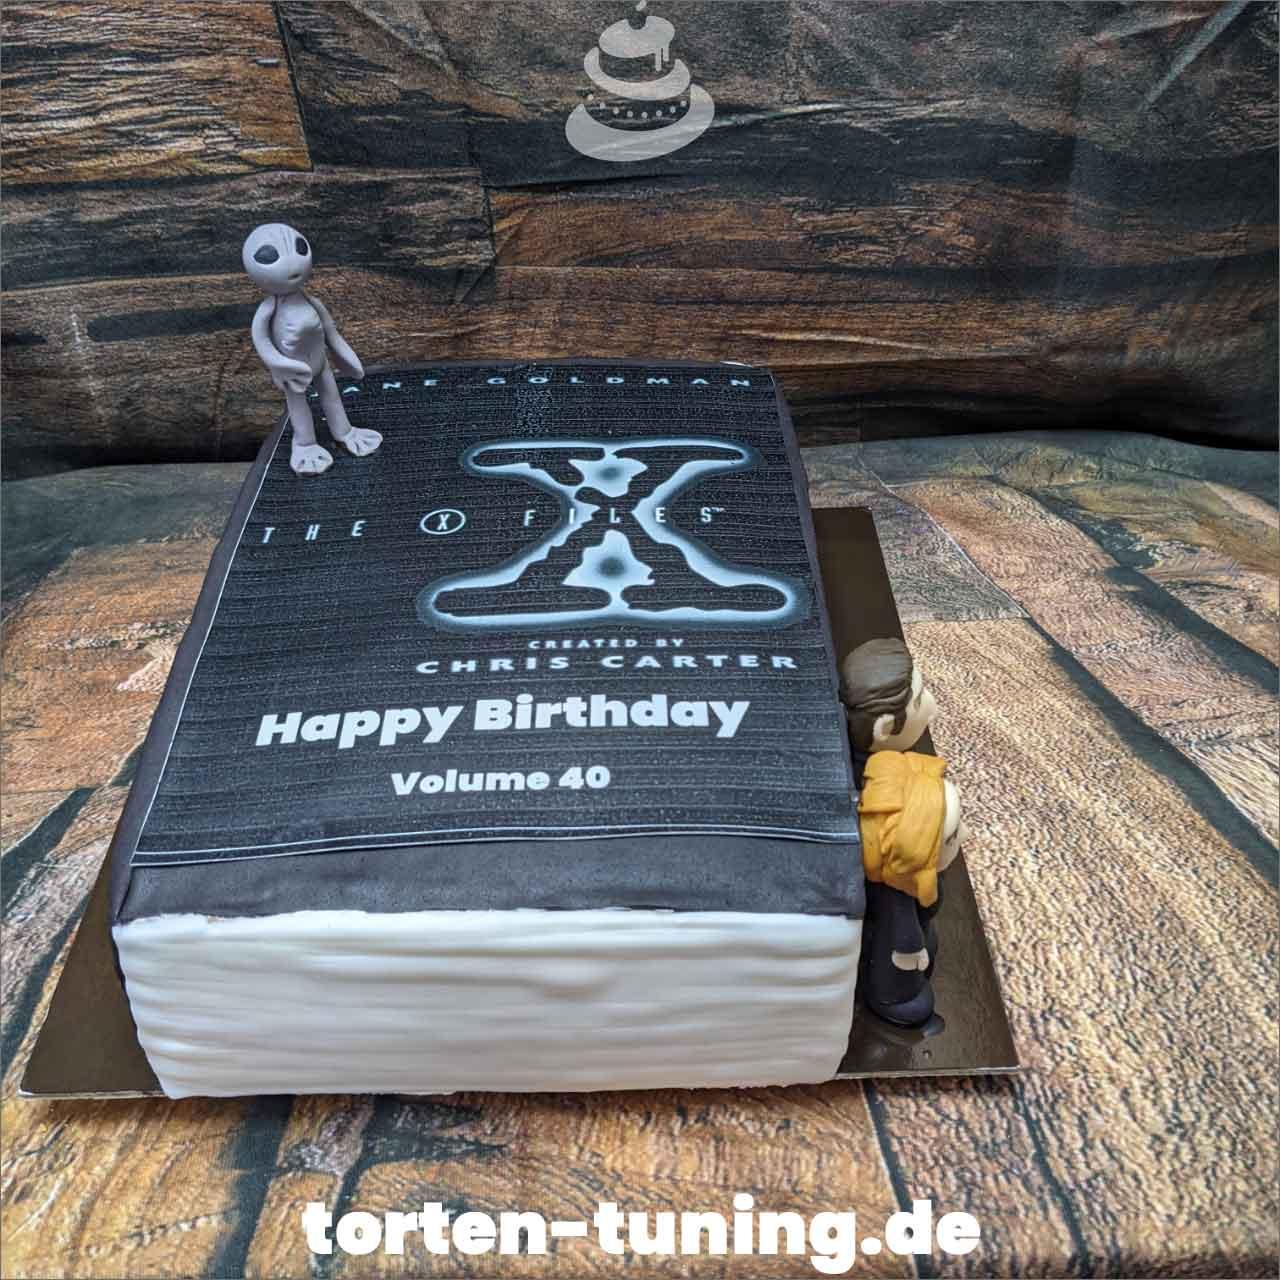 Akte X Skully Moulder Alien Dripcake Obsttorte Geburtstagstorte Motivtorte Torte Tortendekoration Torte online bestellen Suhl Thüringen Torten Tuning Sahnetorte Tortenfiguren Cake Topper